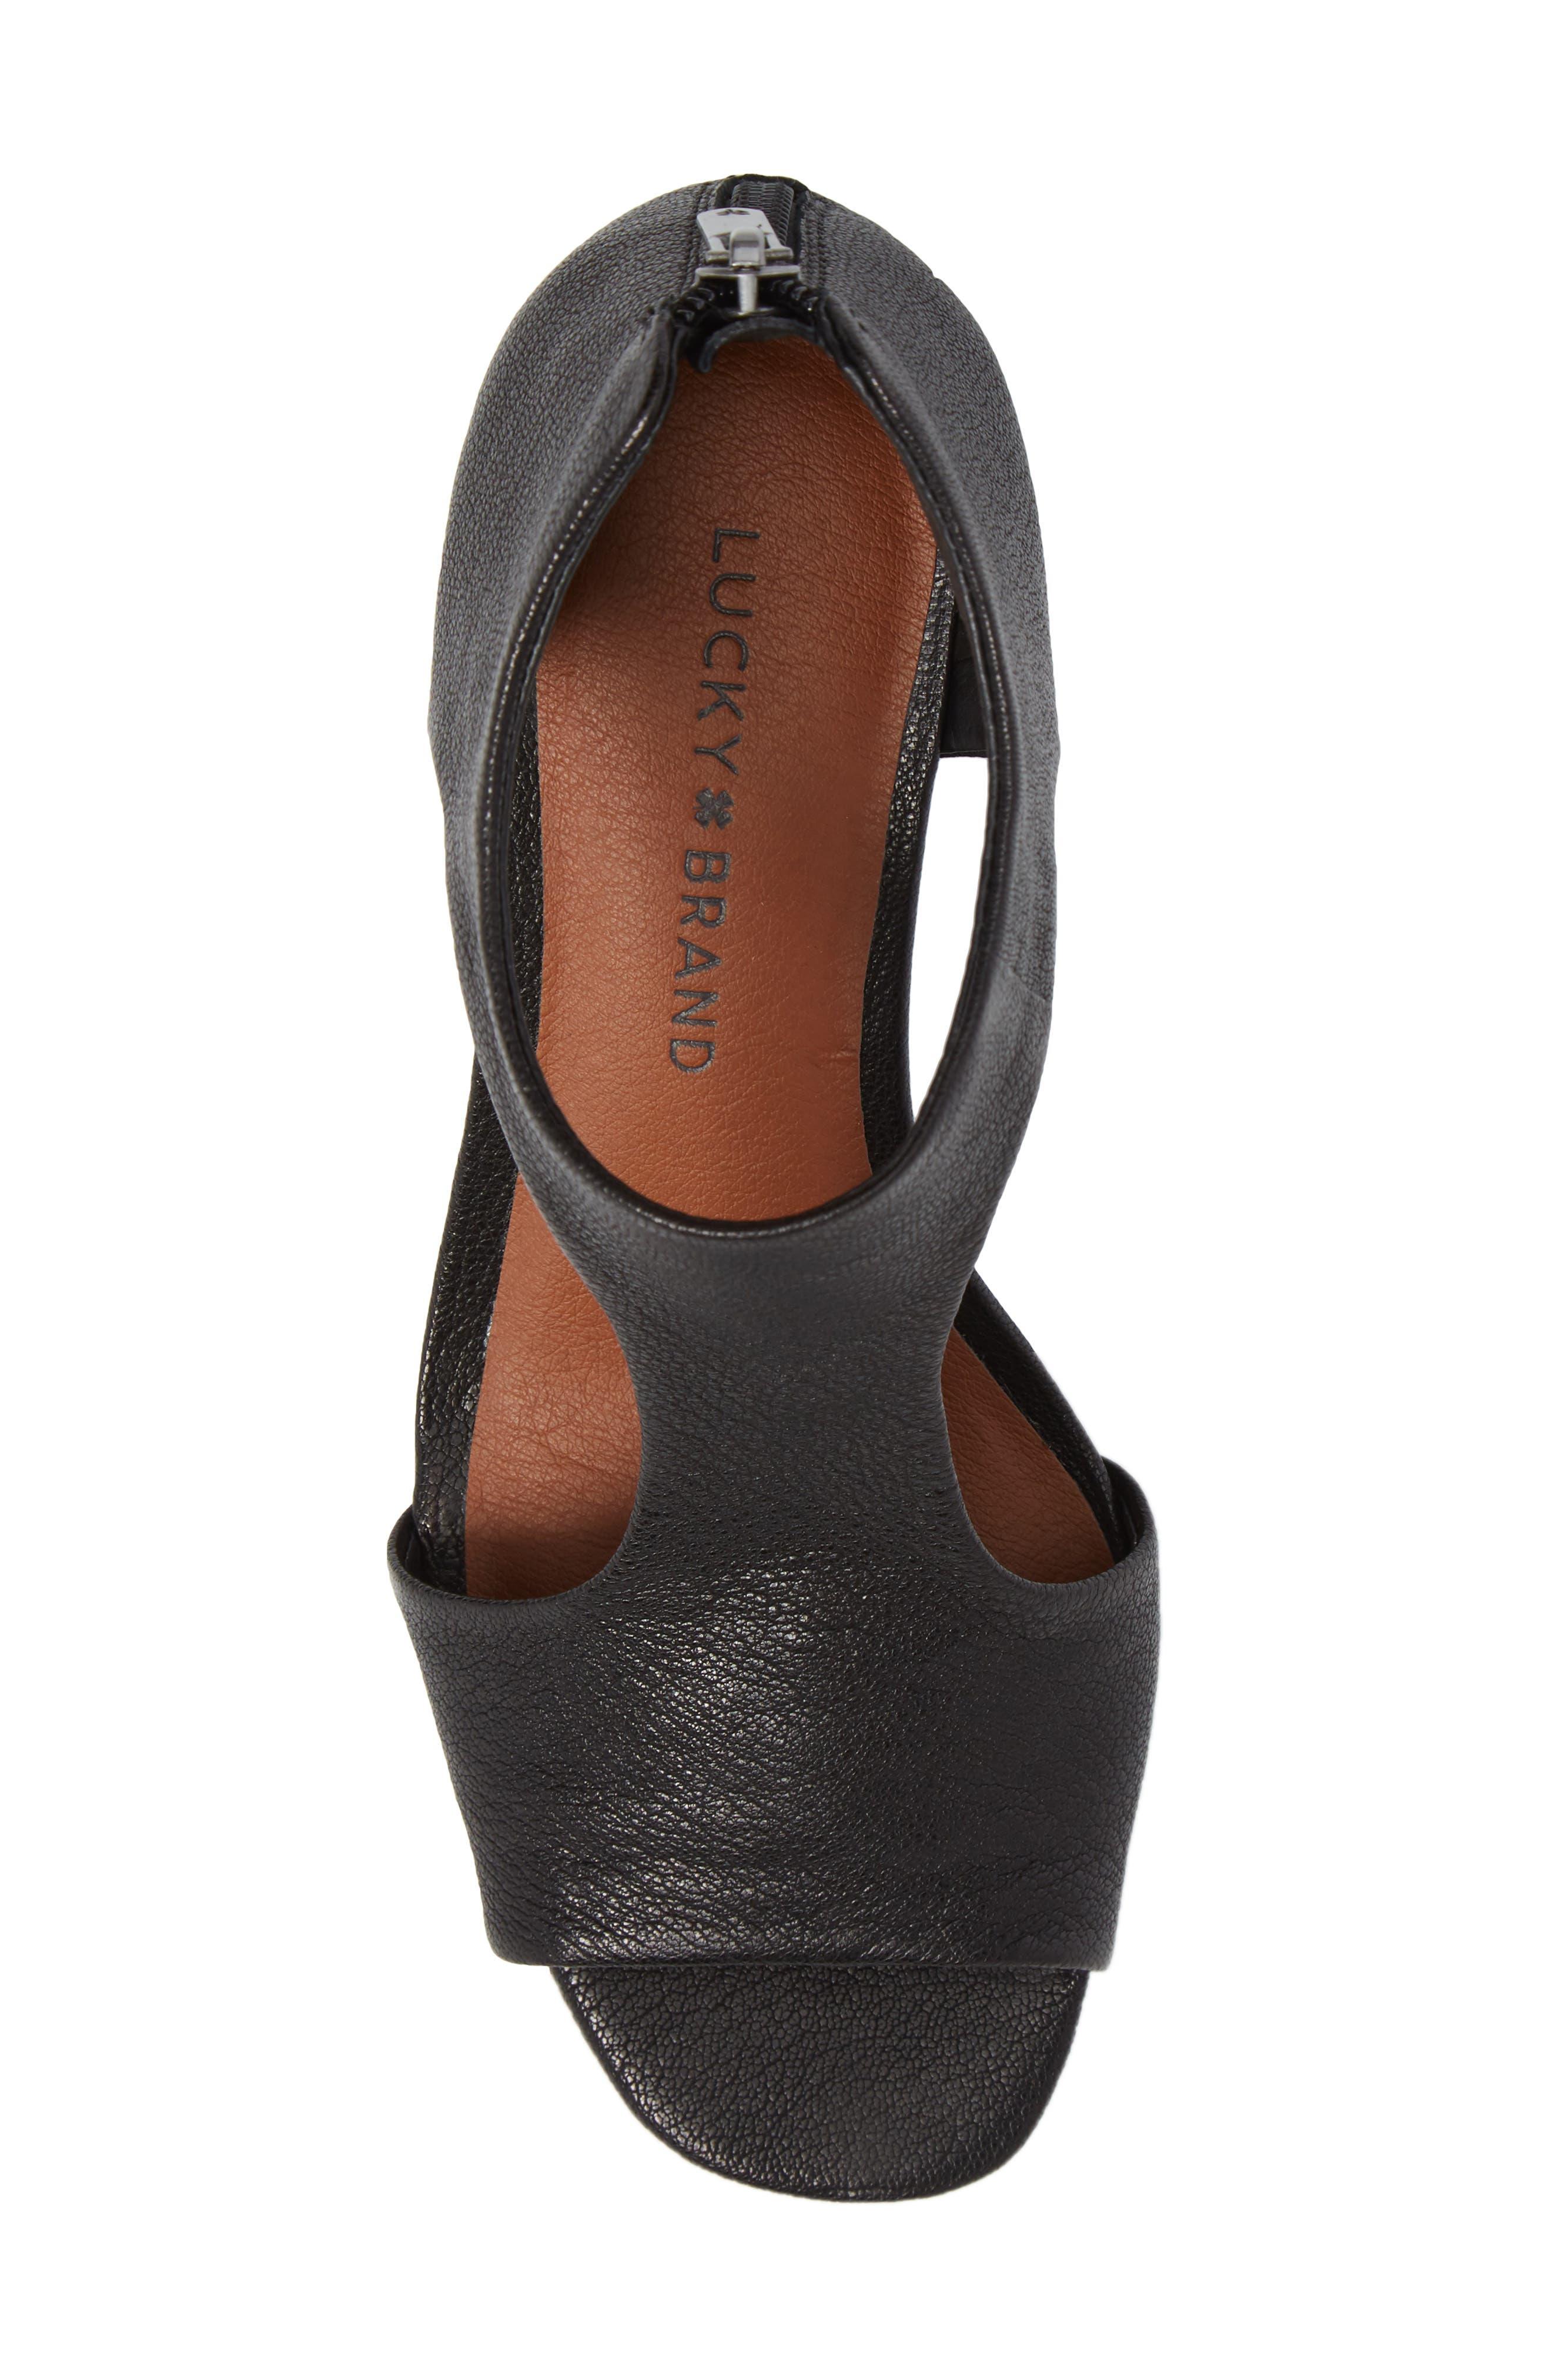 Tehirr Wedge Sandal,                             Alternate thumbnail 5, color,                             001